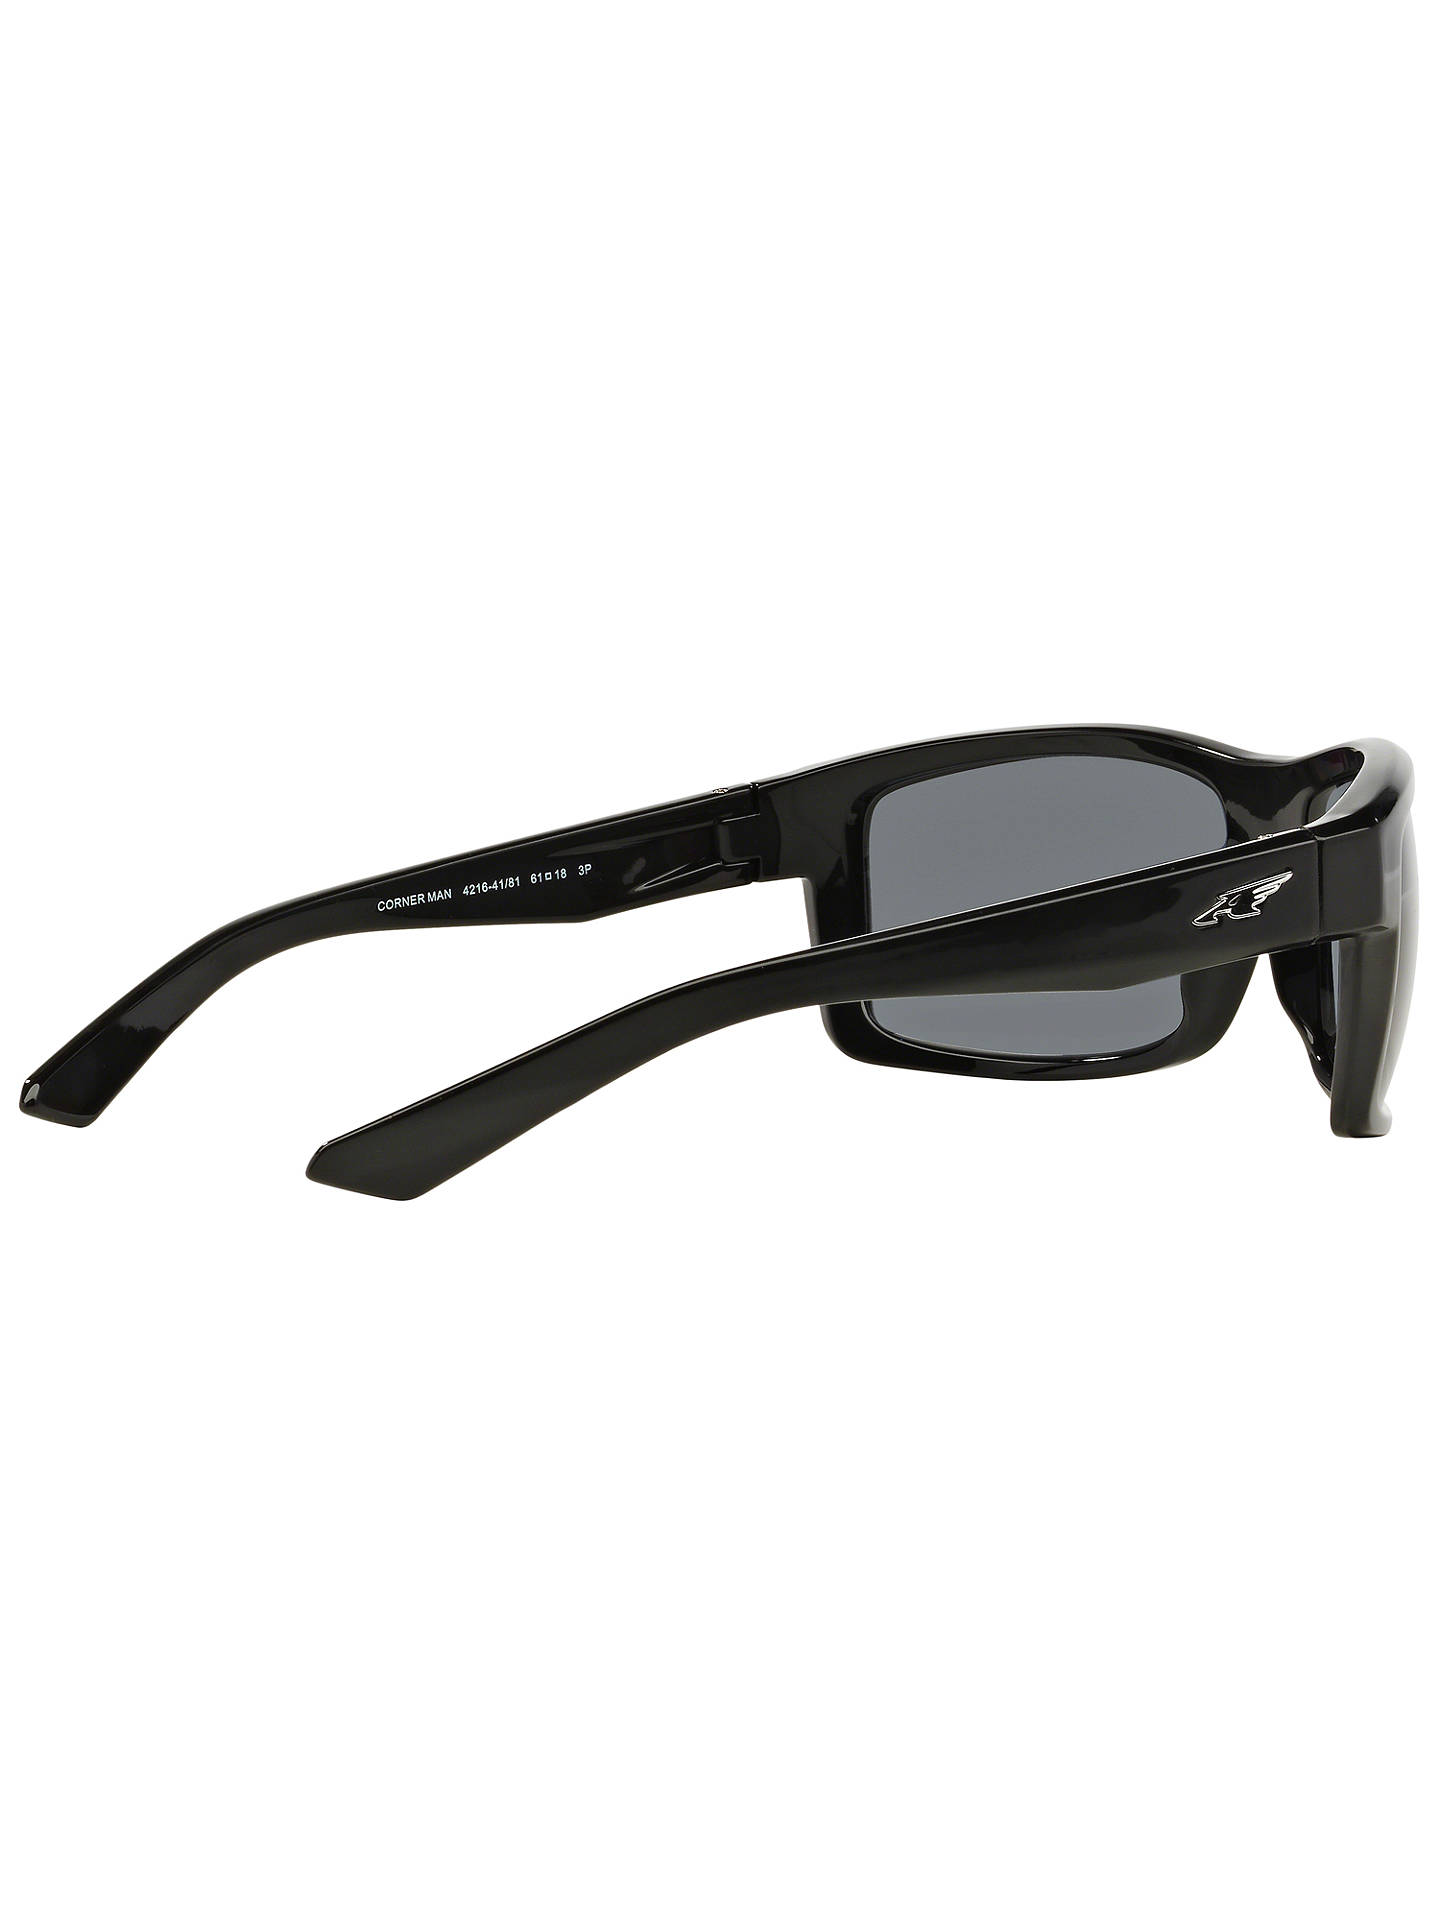 4af5c3475e Arnette AN4216 Corner Man Polarised Rectangular Sunglasses at John ...